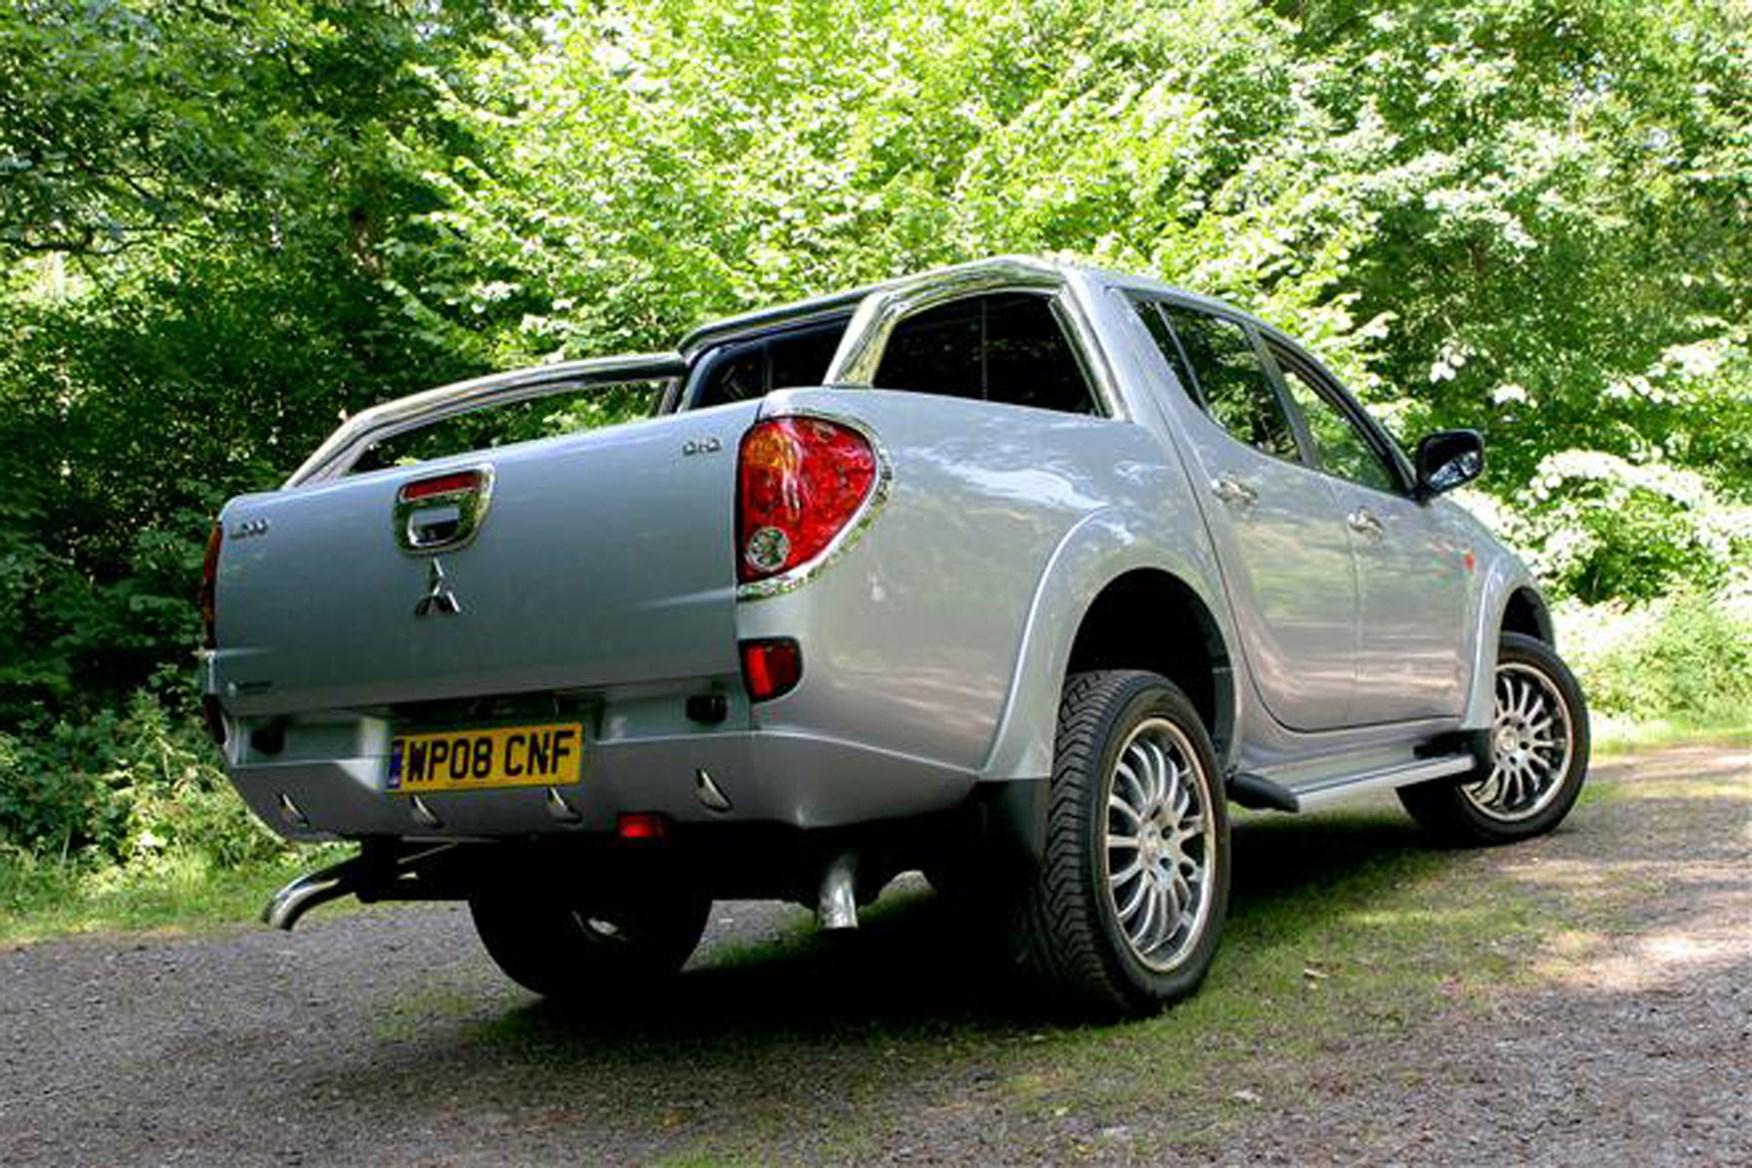 Mitsubishi L200 2006-2015 review on Parkers Vans - rear exterior